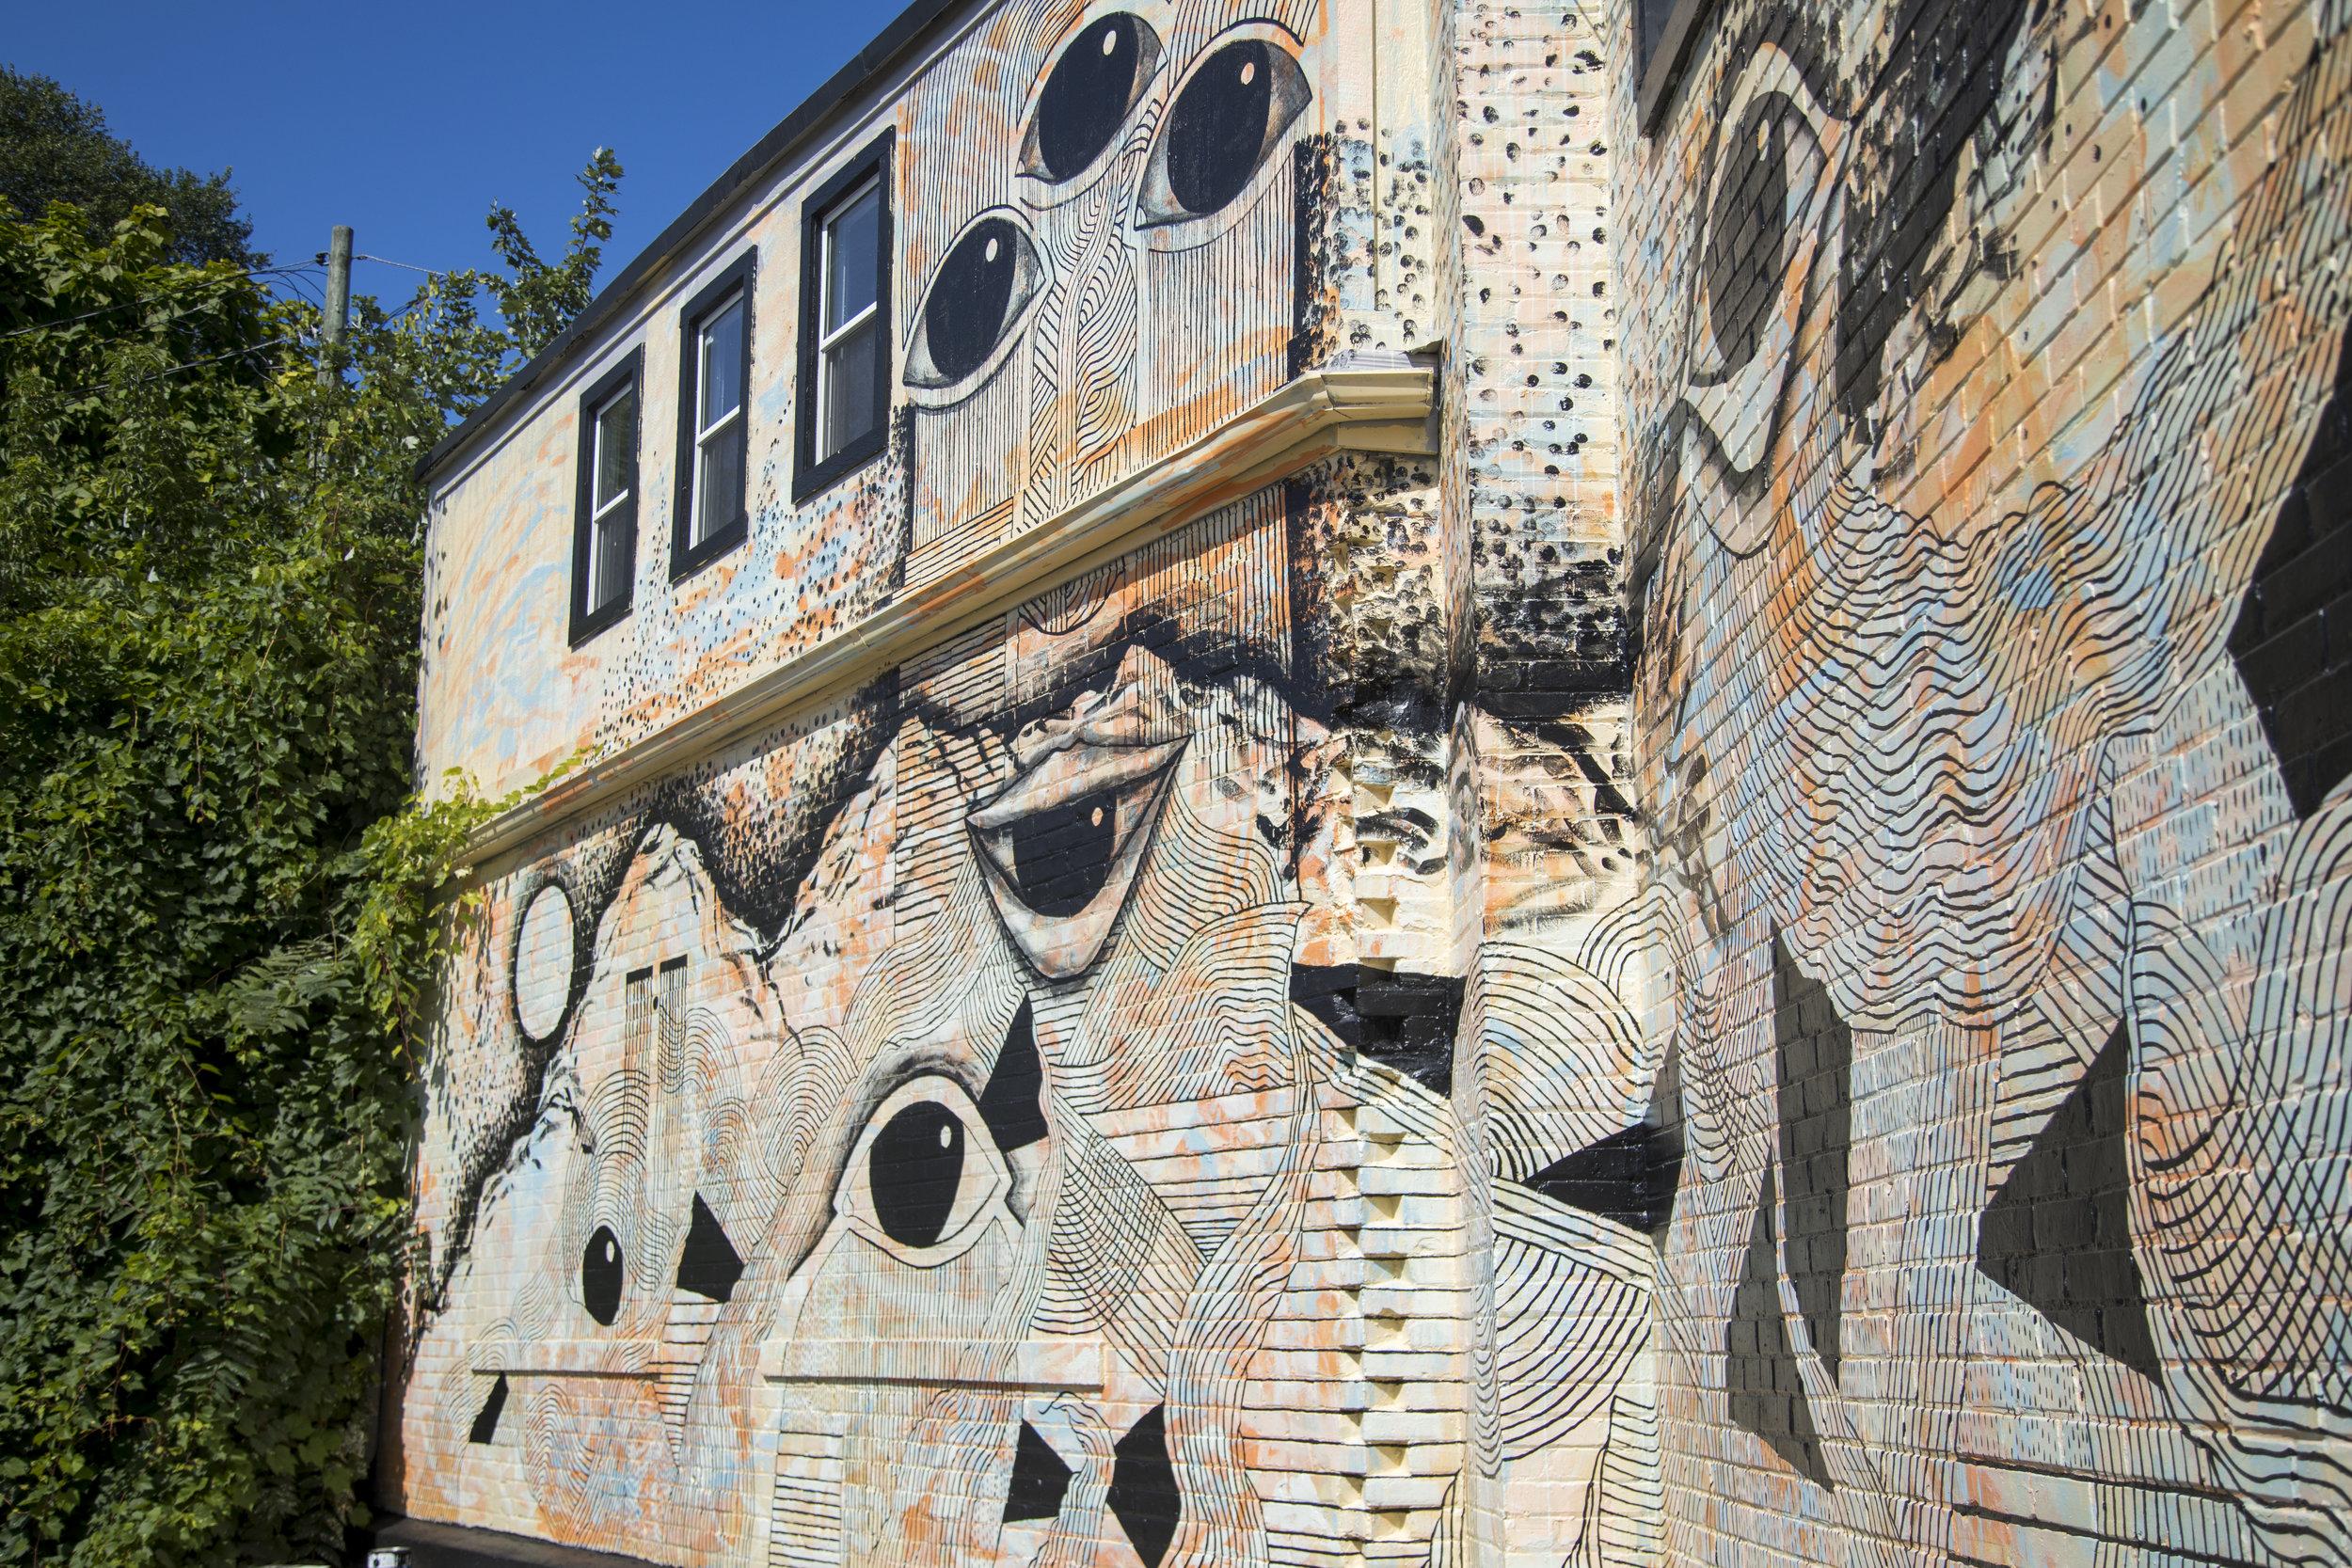 Colby Roanhorse mural in Creston